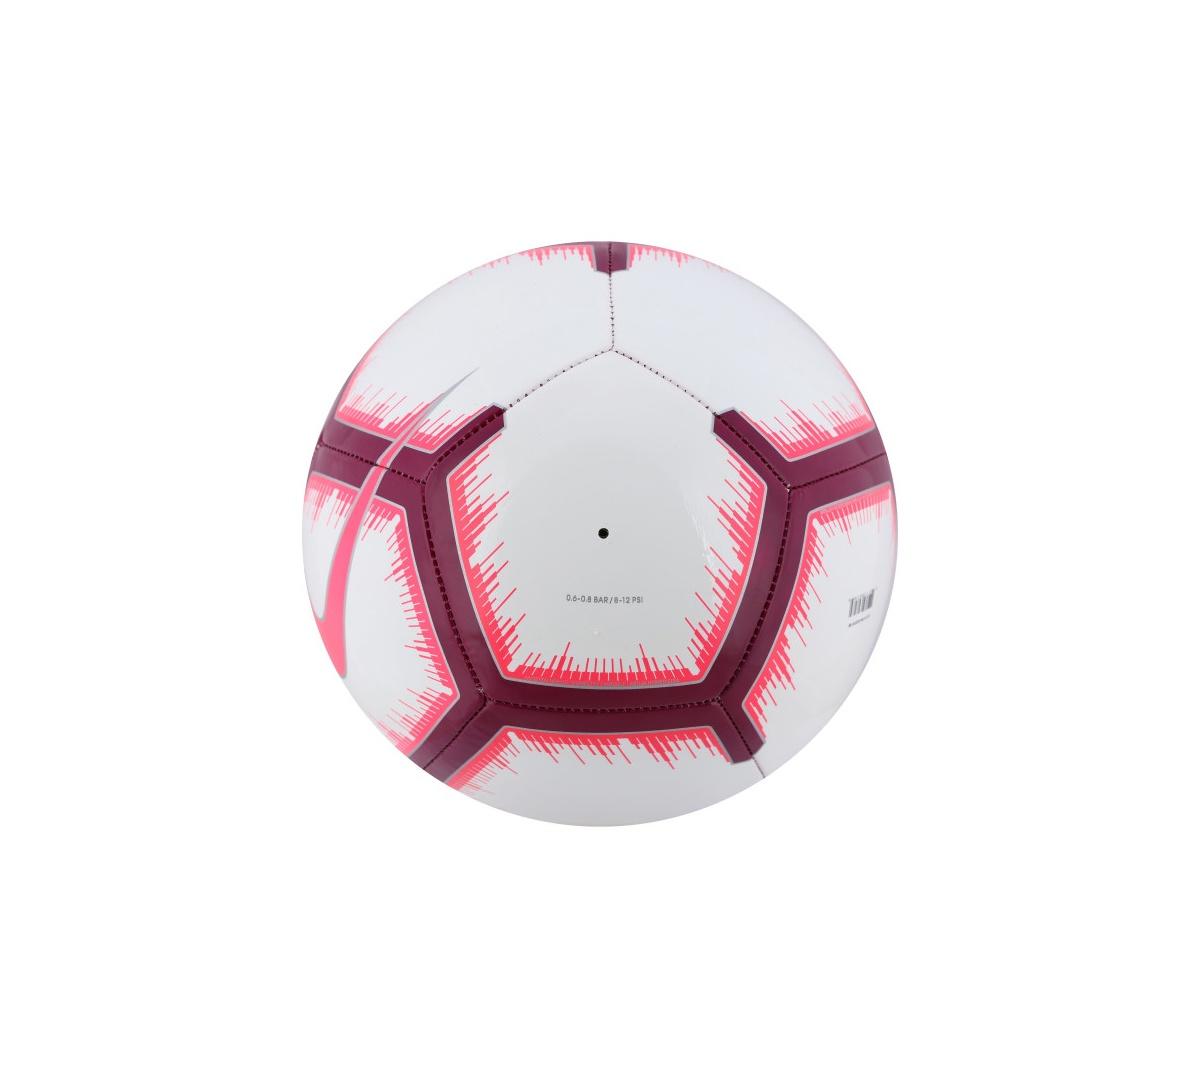 Bola Nike Pitch Campo La Liga 18 19. - Mundo do Futebol 2f9bb4c8109d4